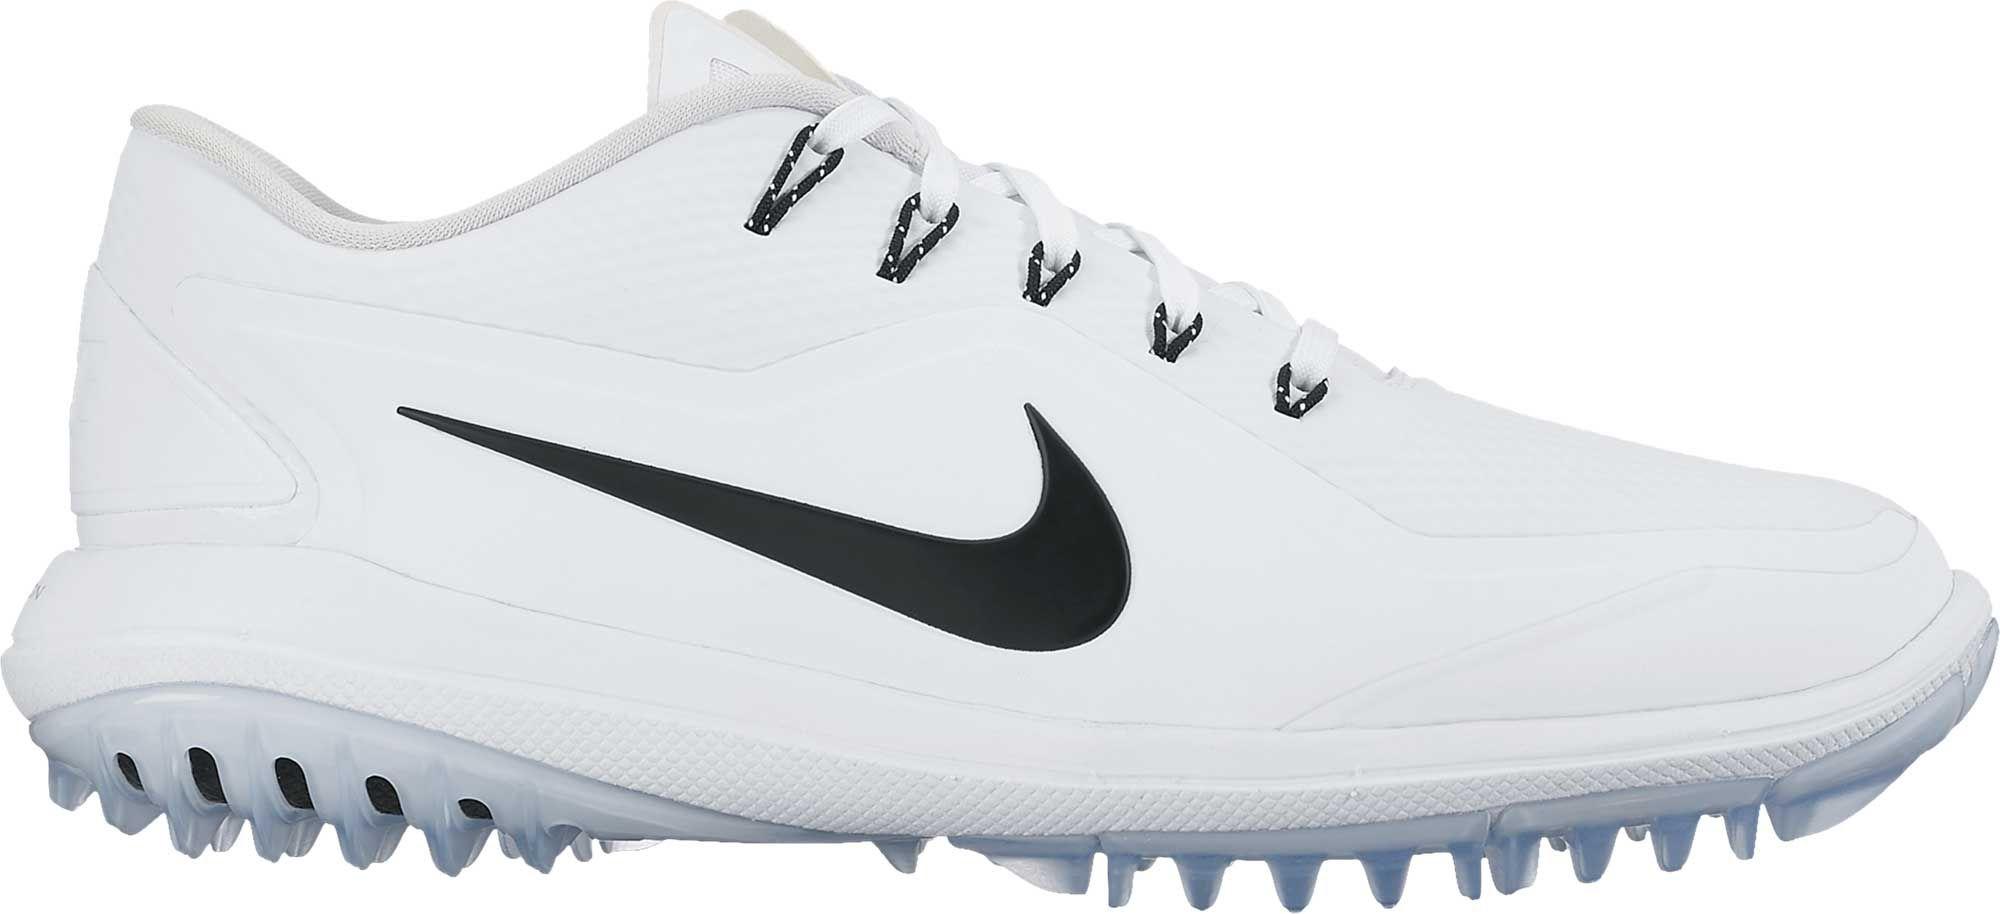 Product Image �� Nike Women\u0027s Lunar Control Vapor 2 Golf Shoes